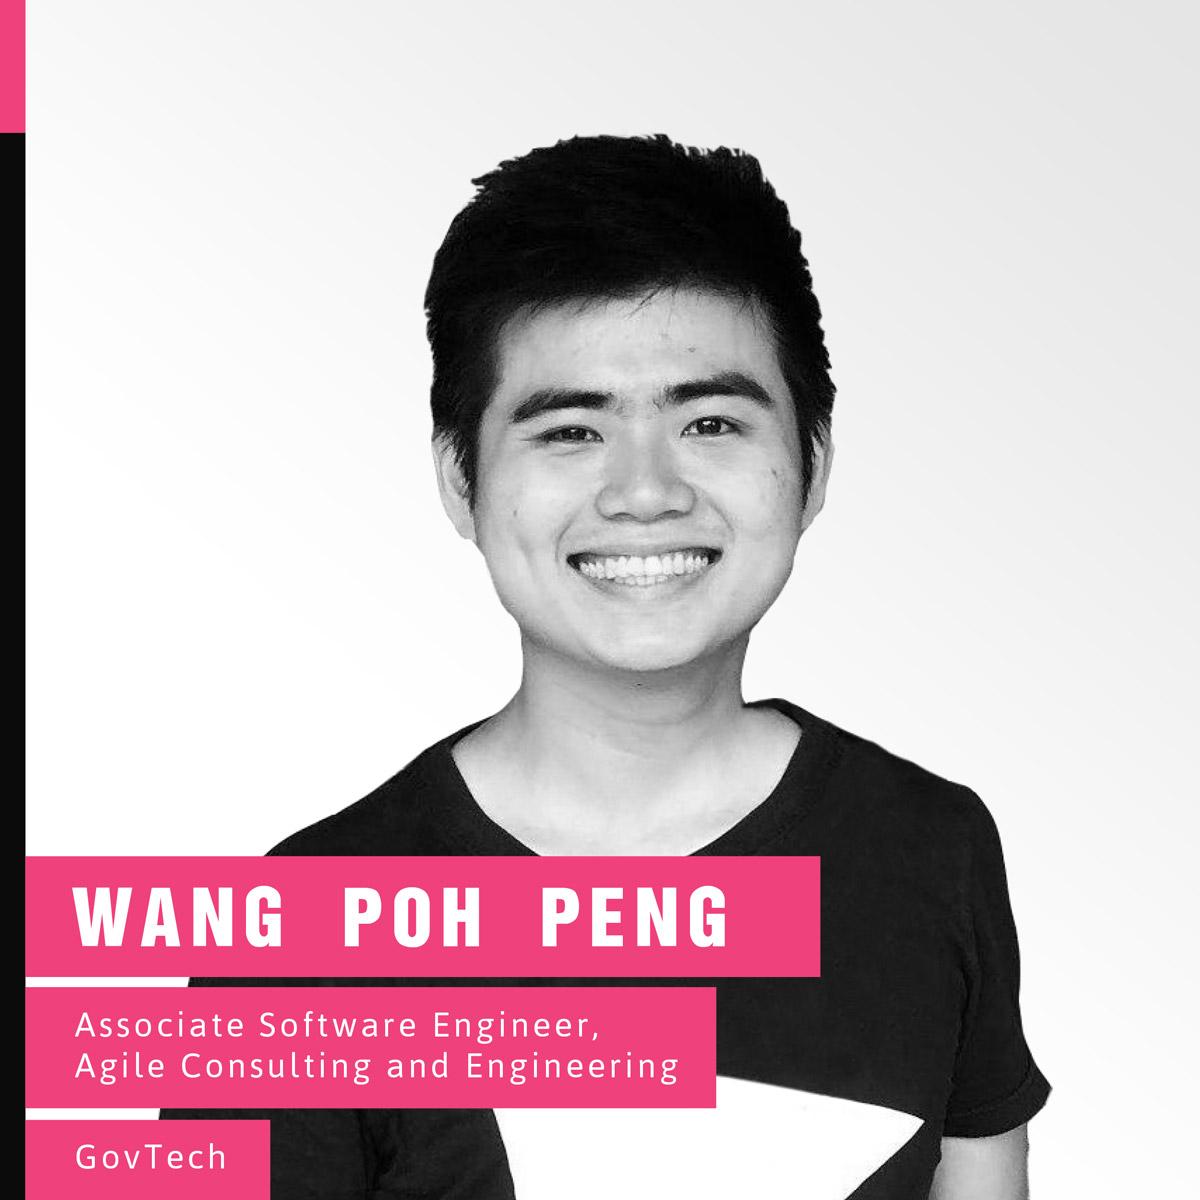 Mr Wang Poh Peng